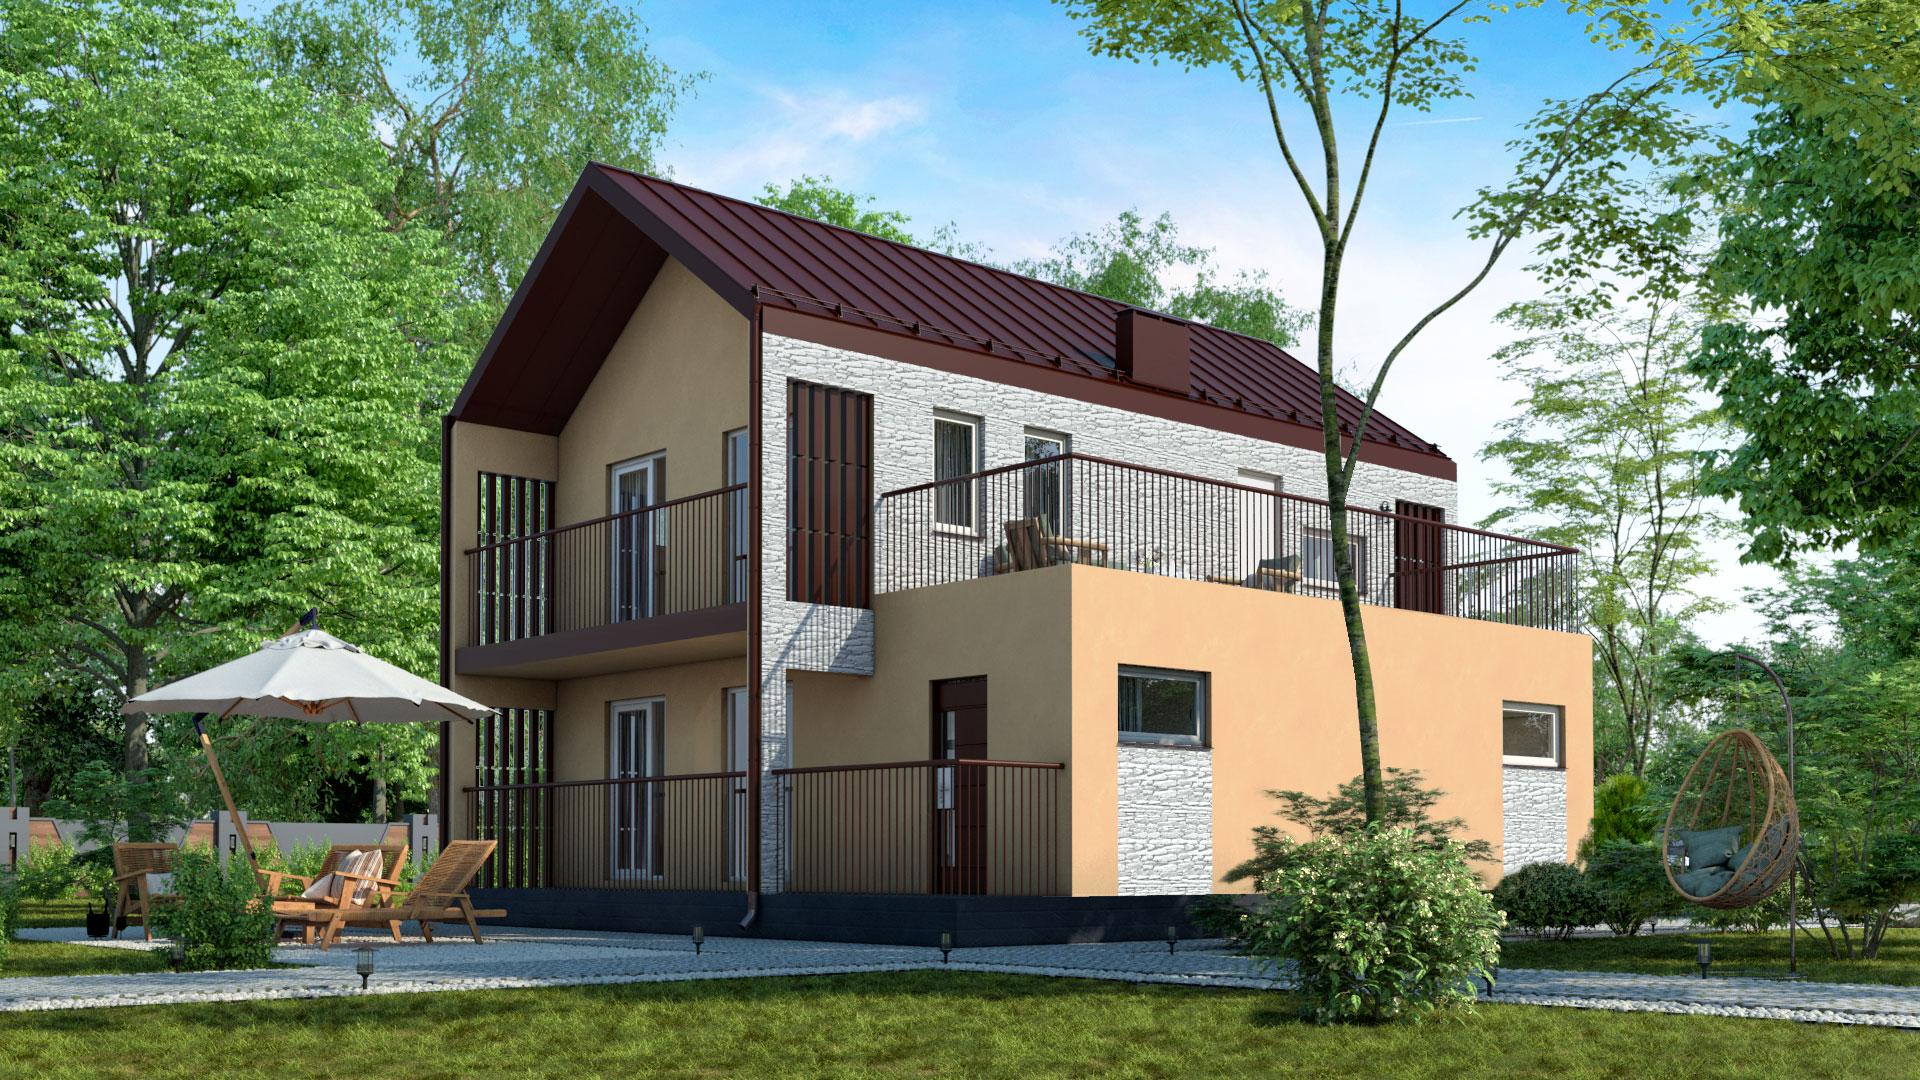 Боковой фасад двухэтажного дома БЭНПАН, проект МС-195.